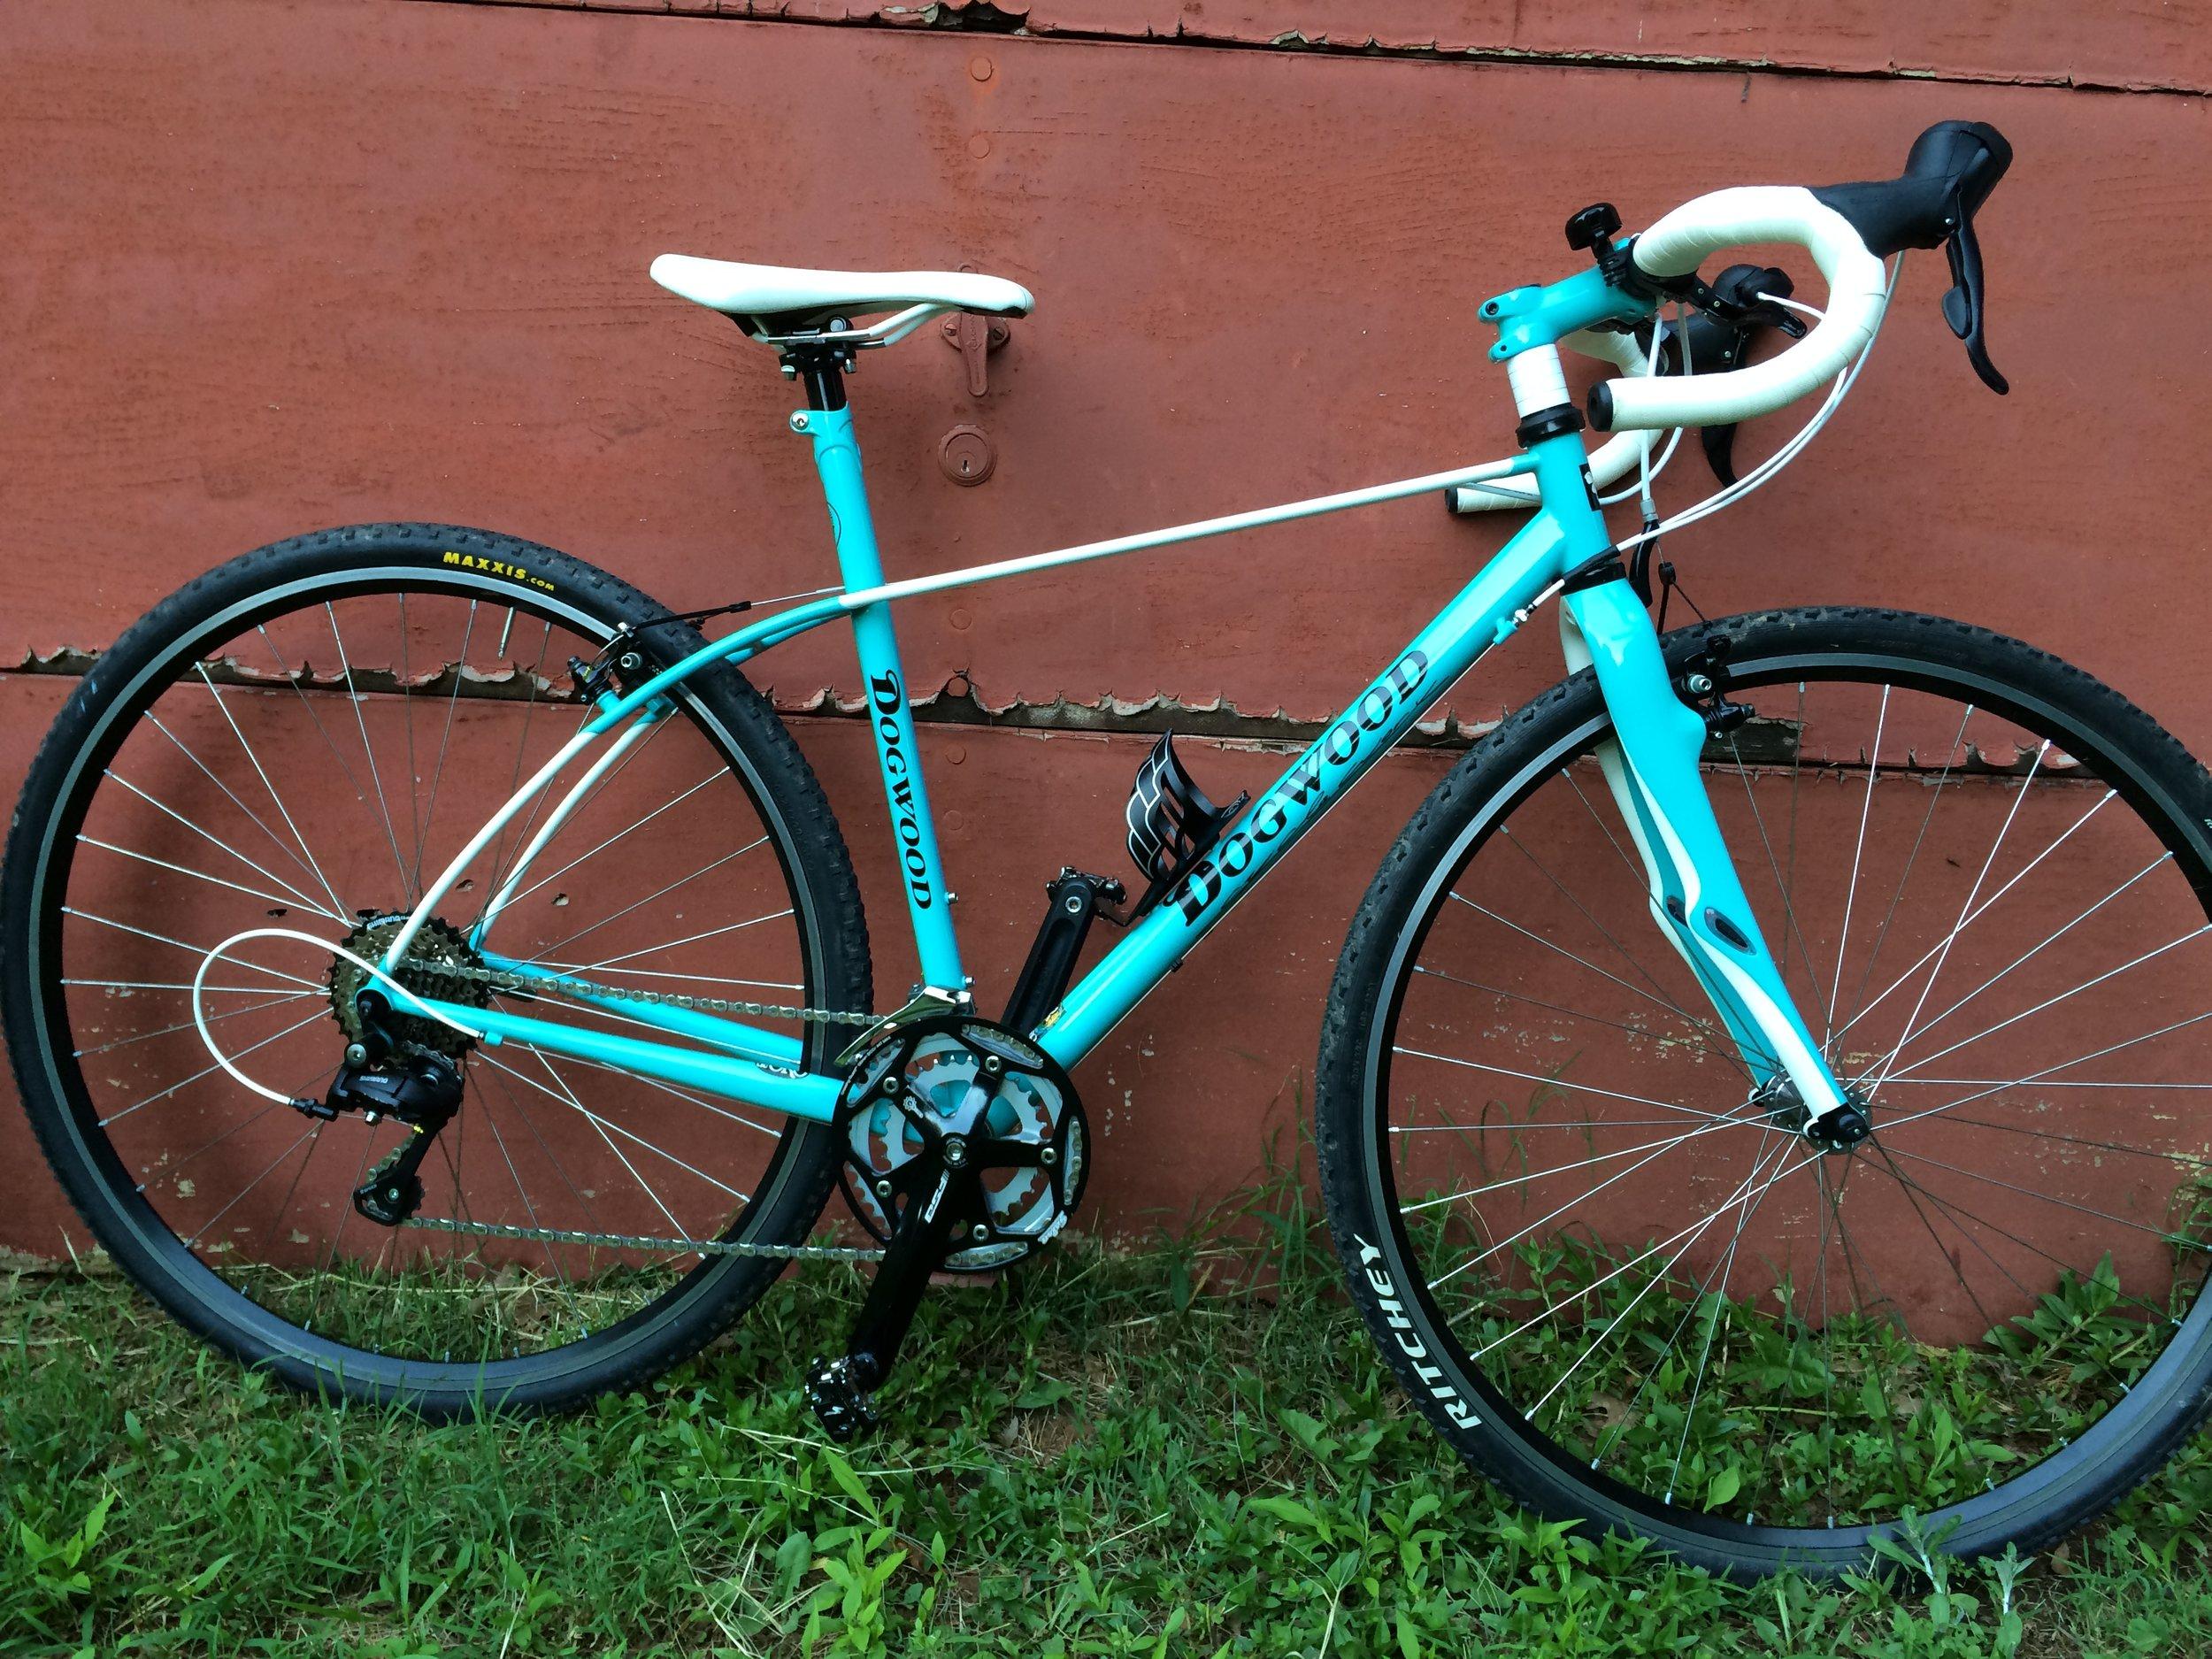 Dogwood-cycleworx-steel-custom-bicycle-columbus-tubing-cyclo-cross-3.jpg